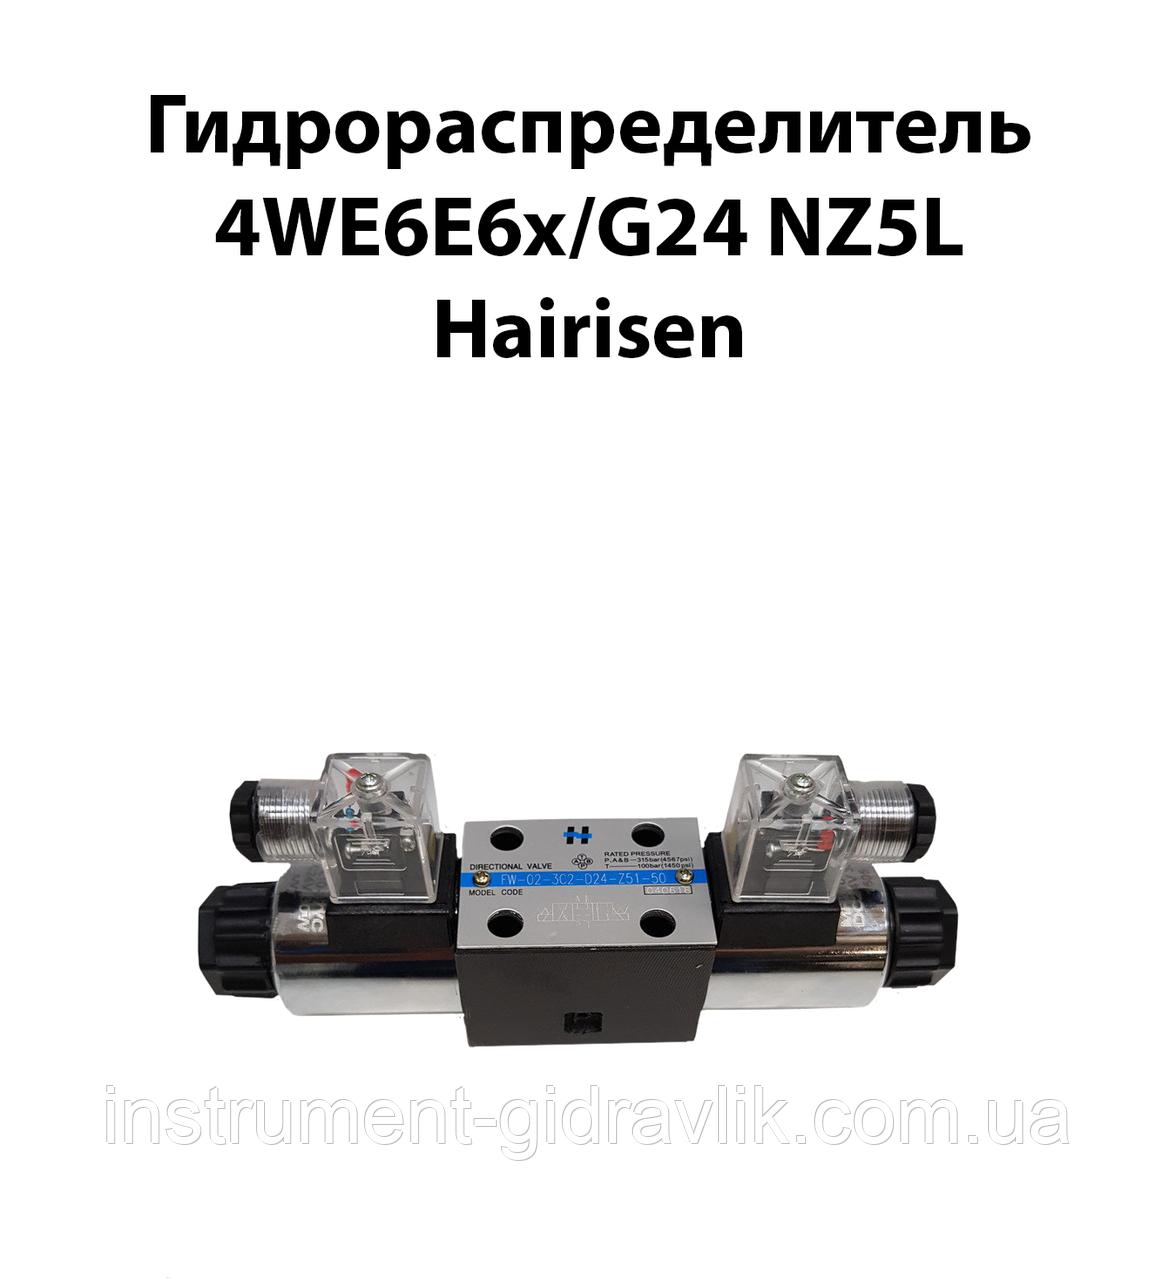 Гидрораспределитель 4WE6E6X/G24 NZ5L HAIRISEN(ВЕ 6 44 24В) Ду 6мм 32МПа 16л/мин